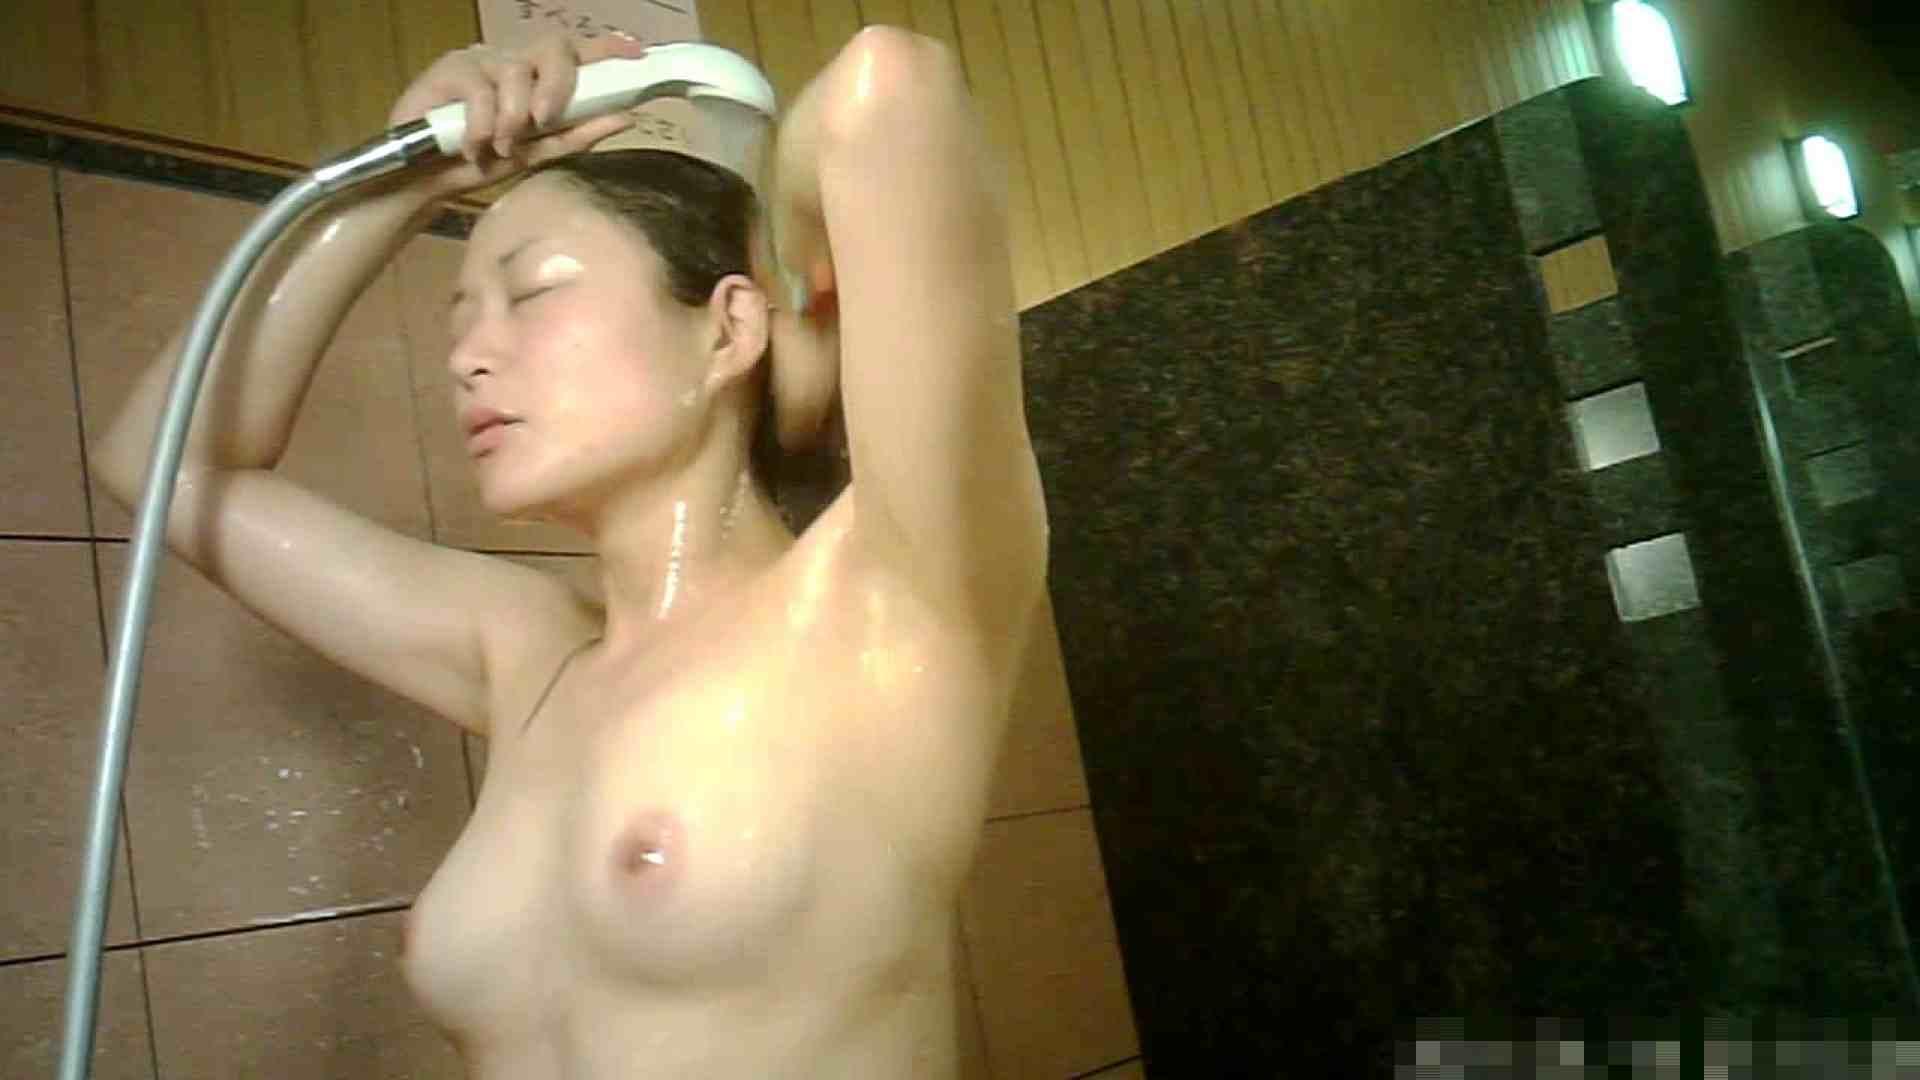 No.1 洗い場!!とっても綺麗な身体のお女市さん、乳首も綺麗です。 銭湯 | 潜入エロ調査  23連発 11